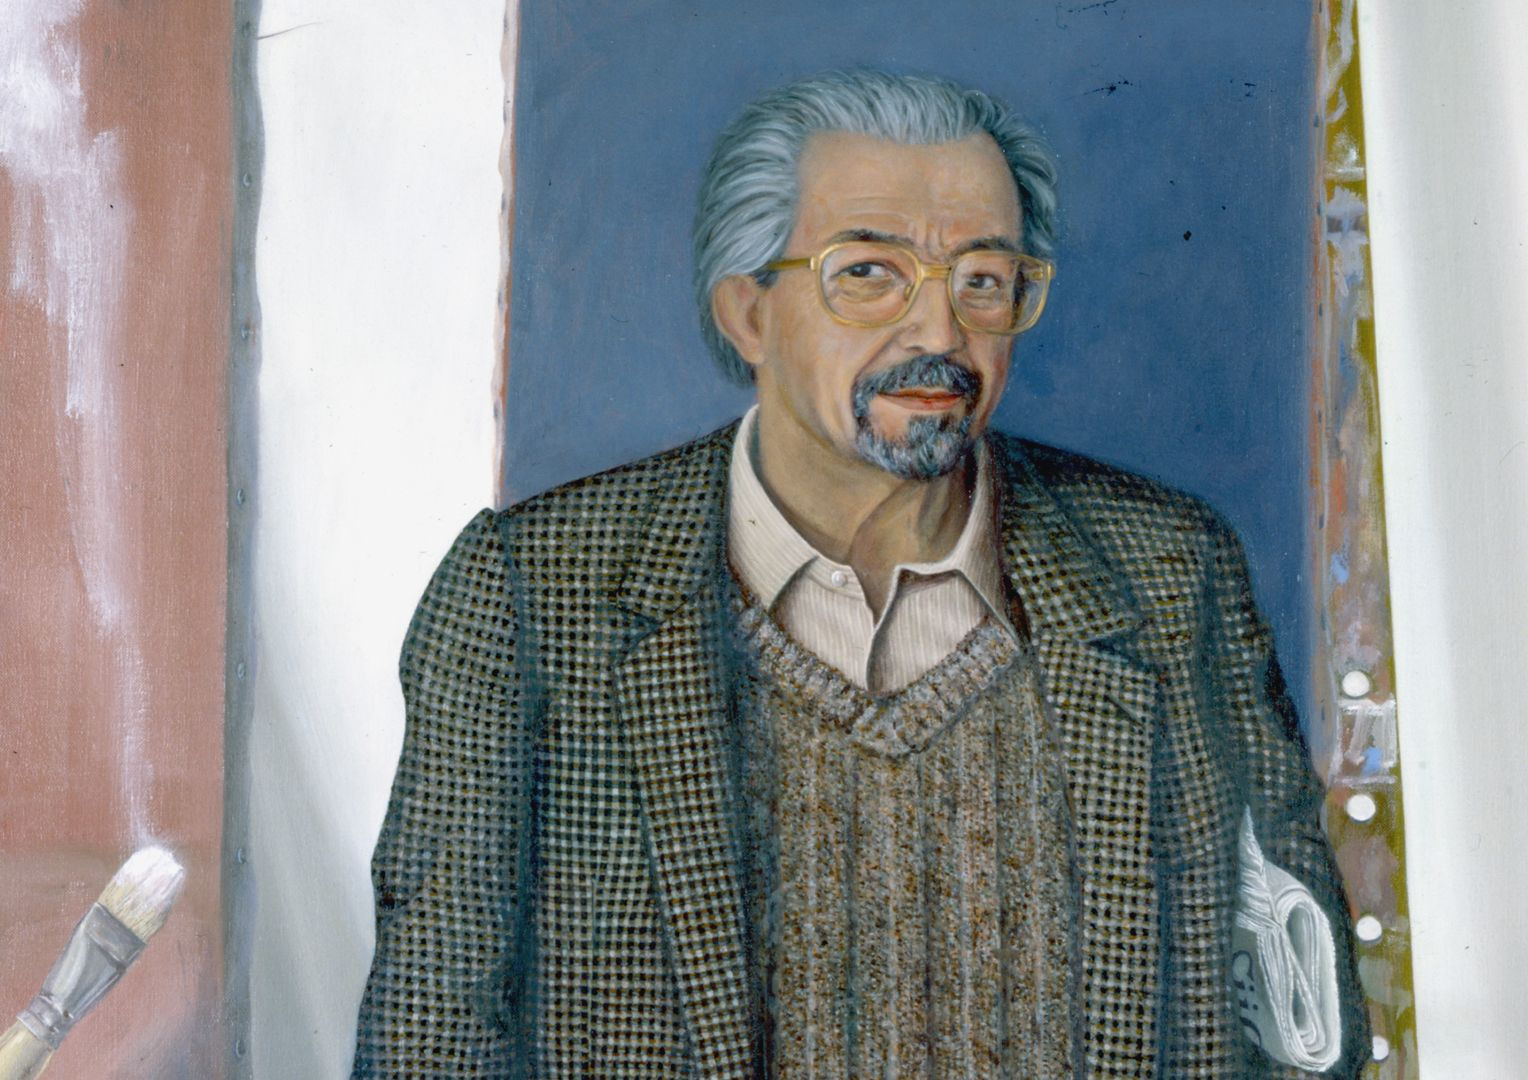 Porträt des Dr. Gerhard Mammel im Atelier Oberkörper